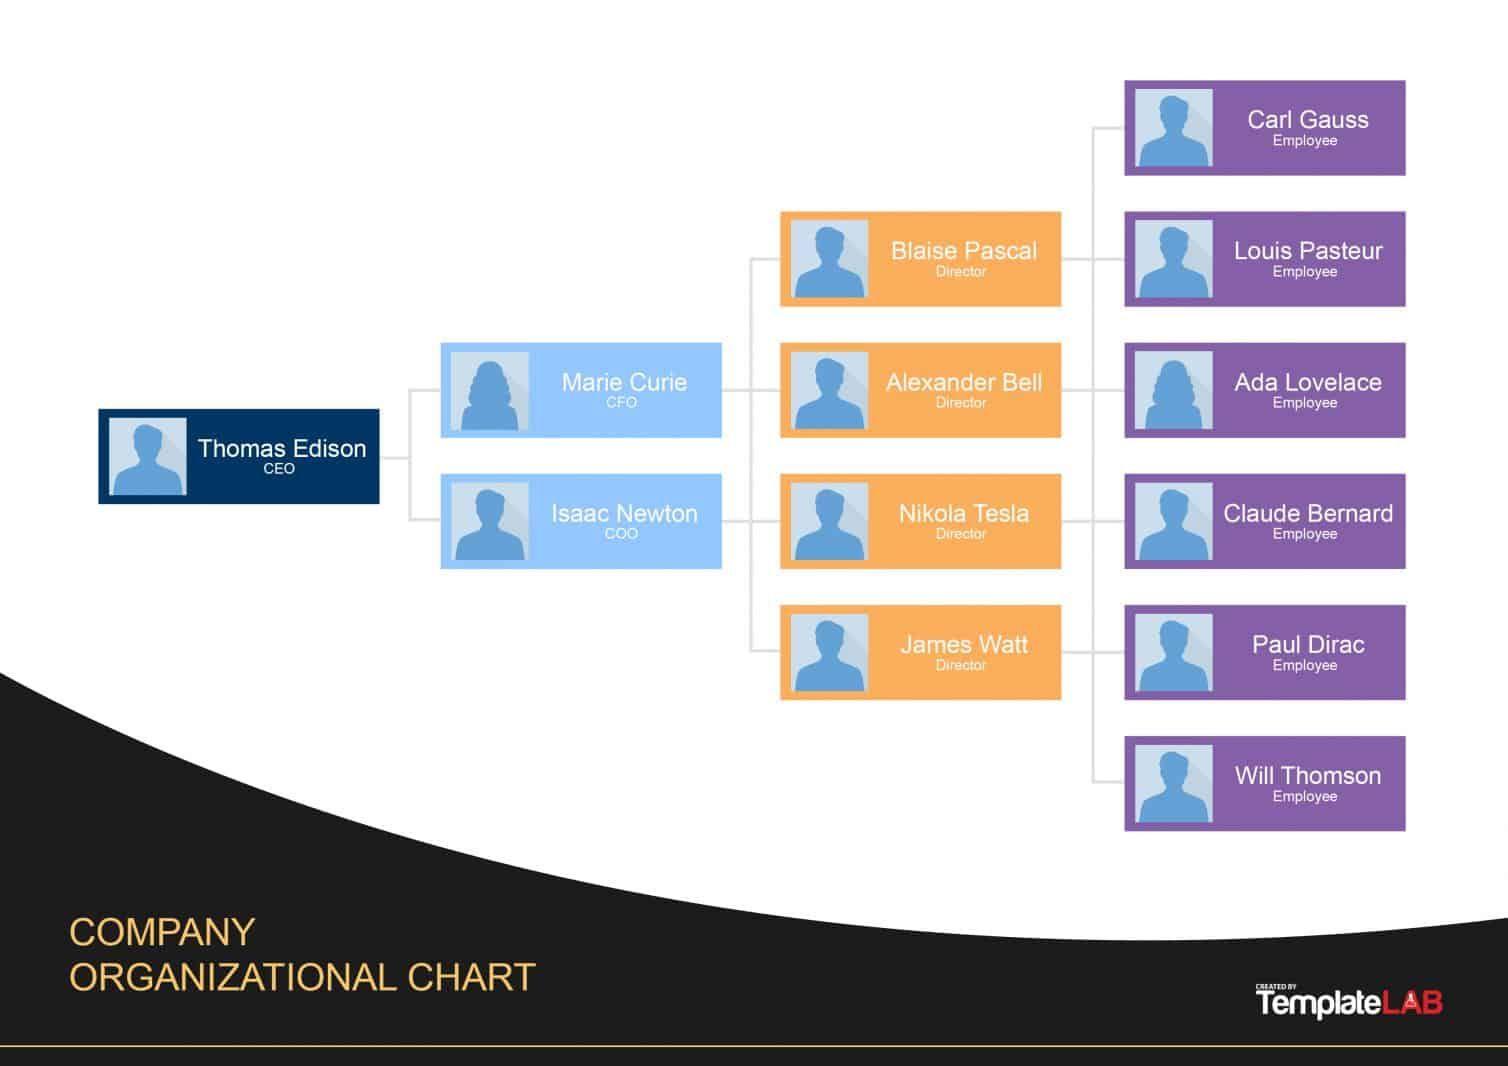 Download Org Chart Template 4 Organizational Chart Org Chart Organization Chart Organizational chart template free download